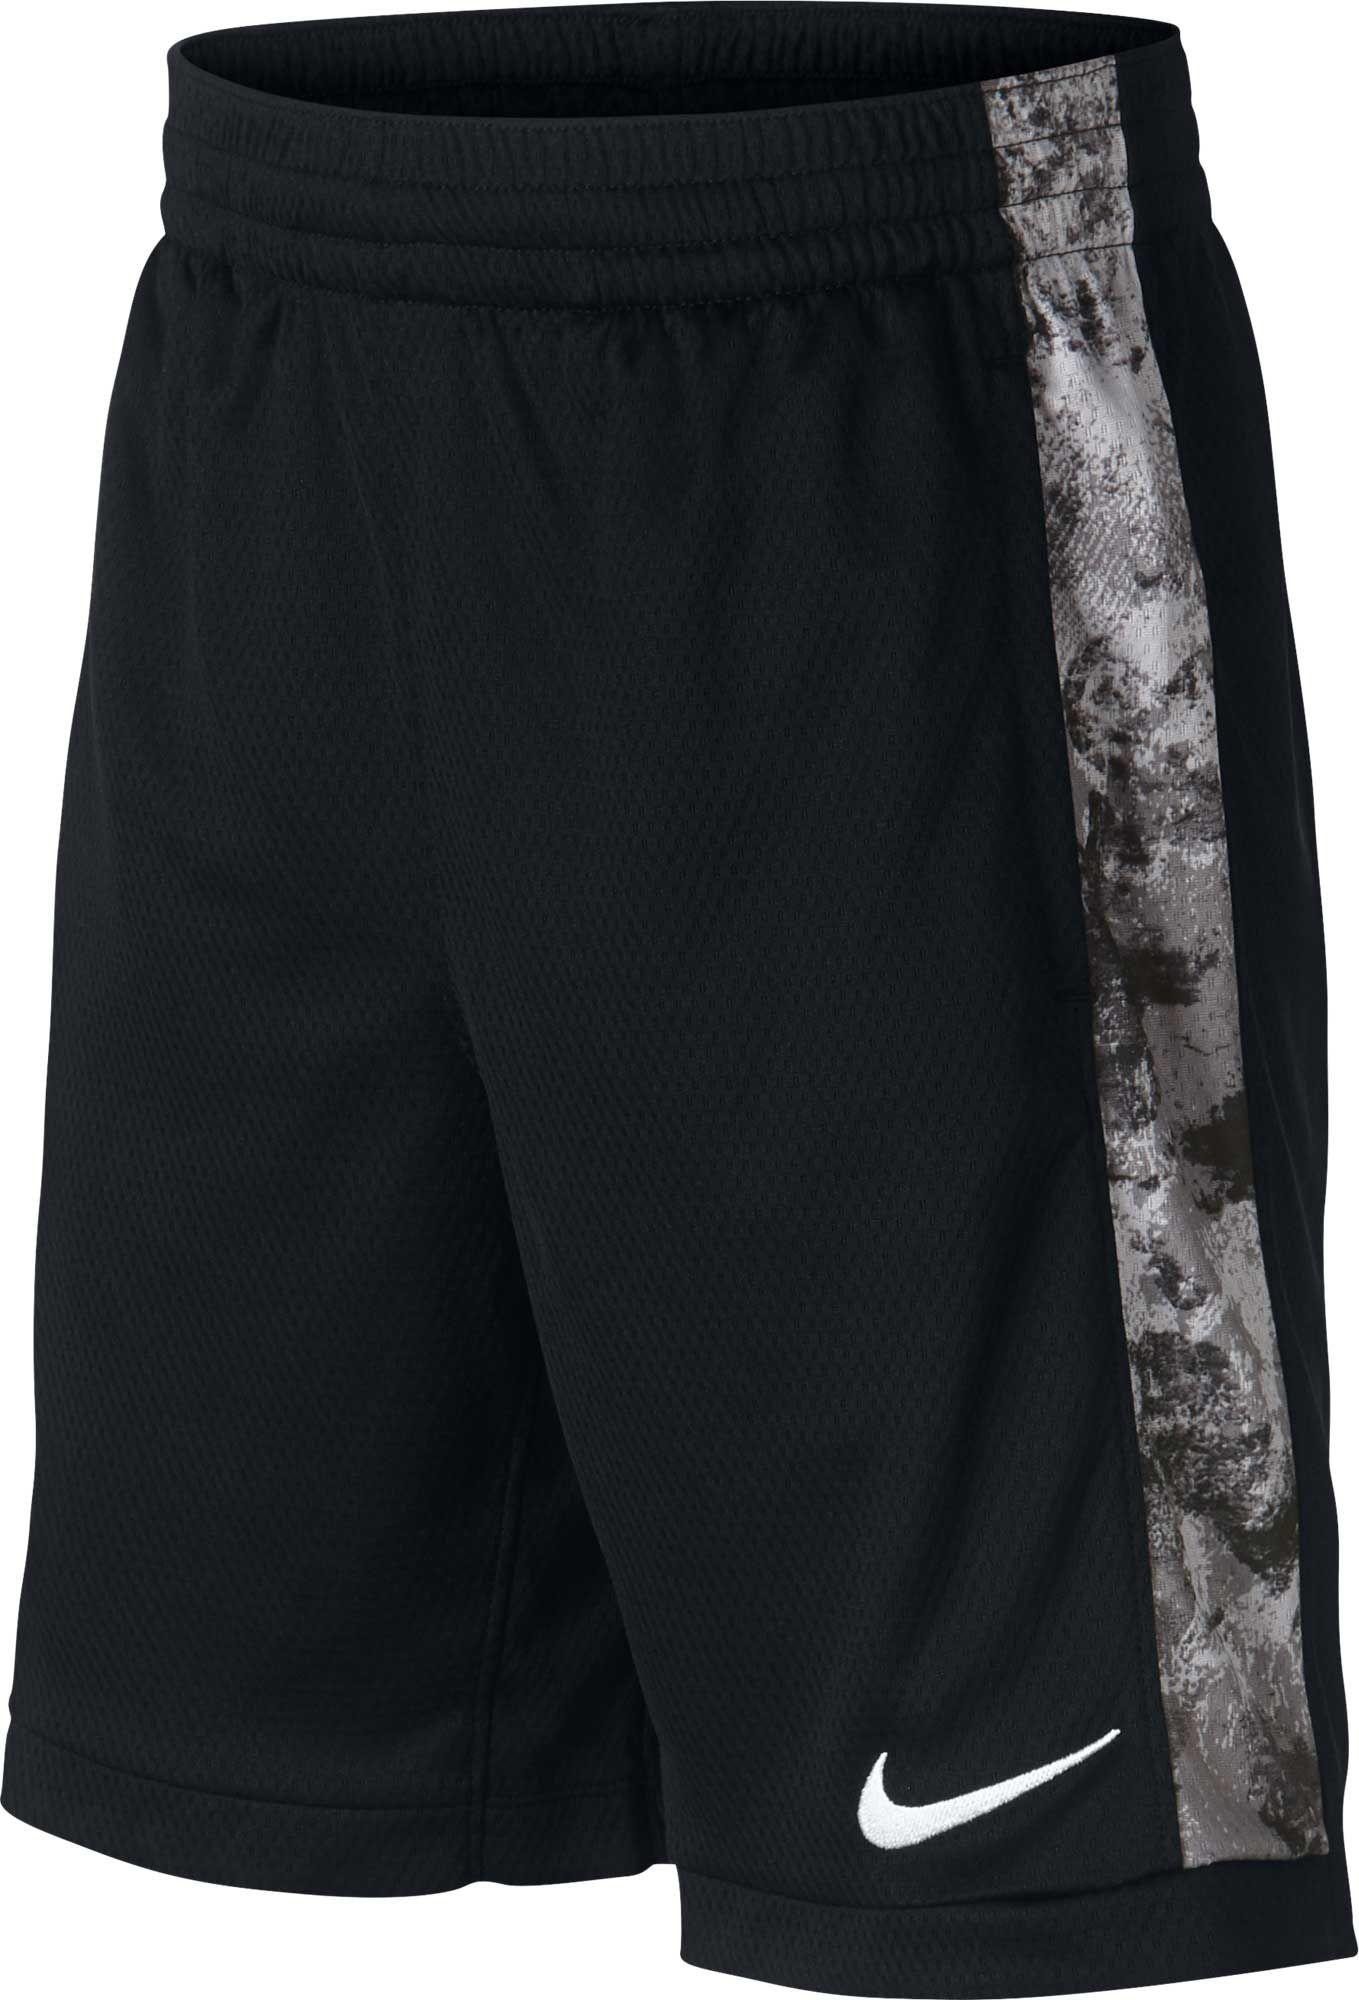 Nike Boys Trophy Dri Fit Novelty Shorts Size Medium Black Boys Nike Shorts Boys Short Outfits Summer Shorts Outfits